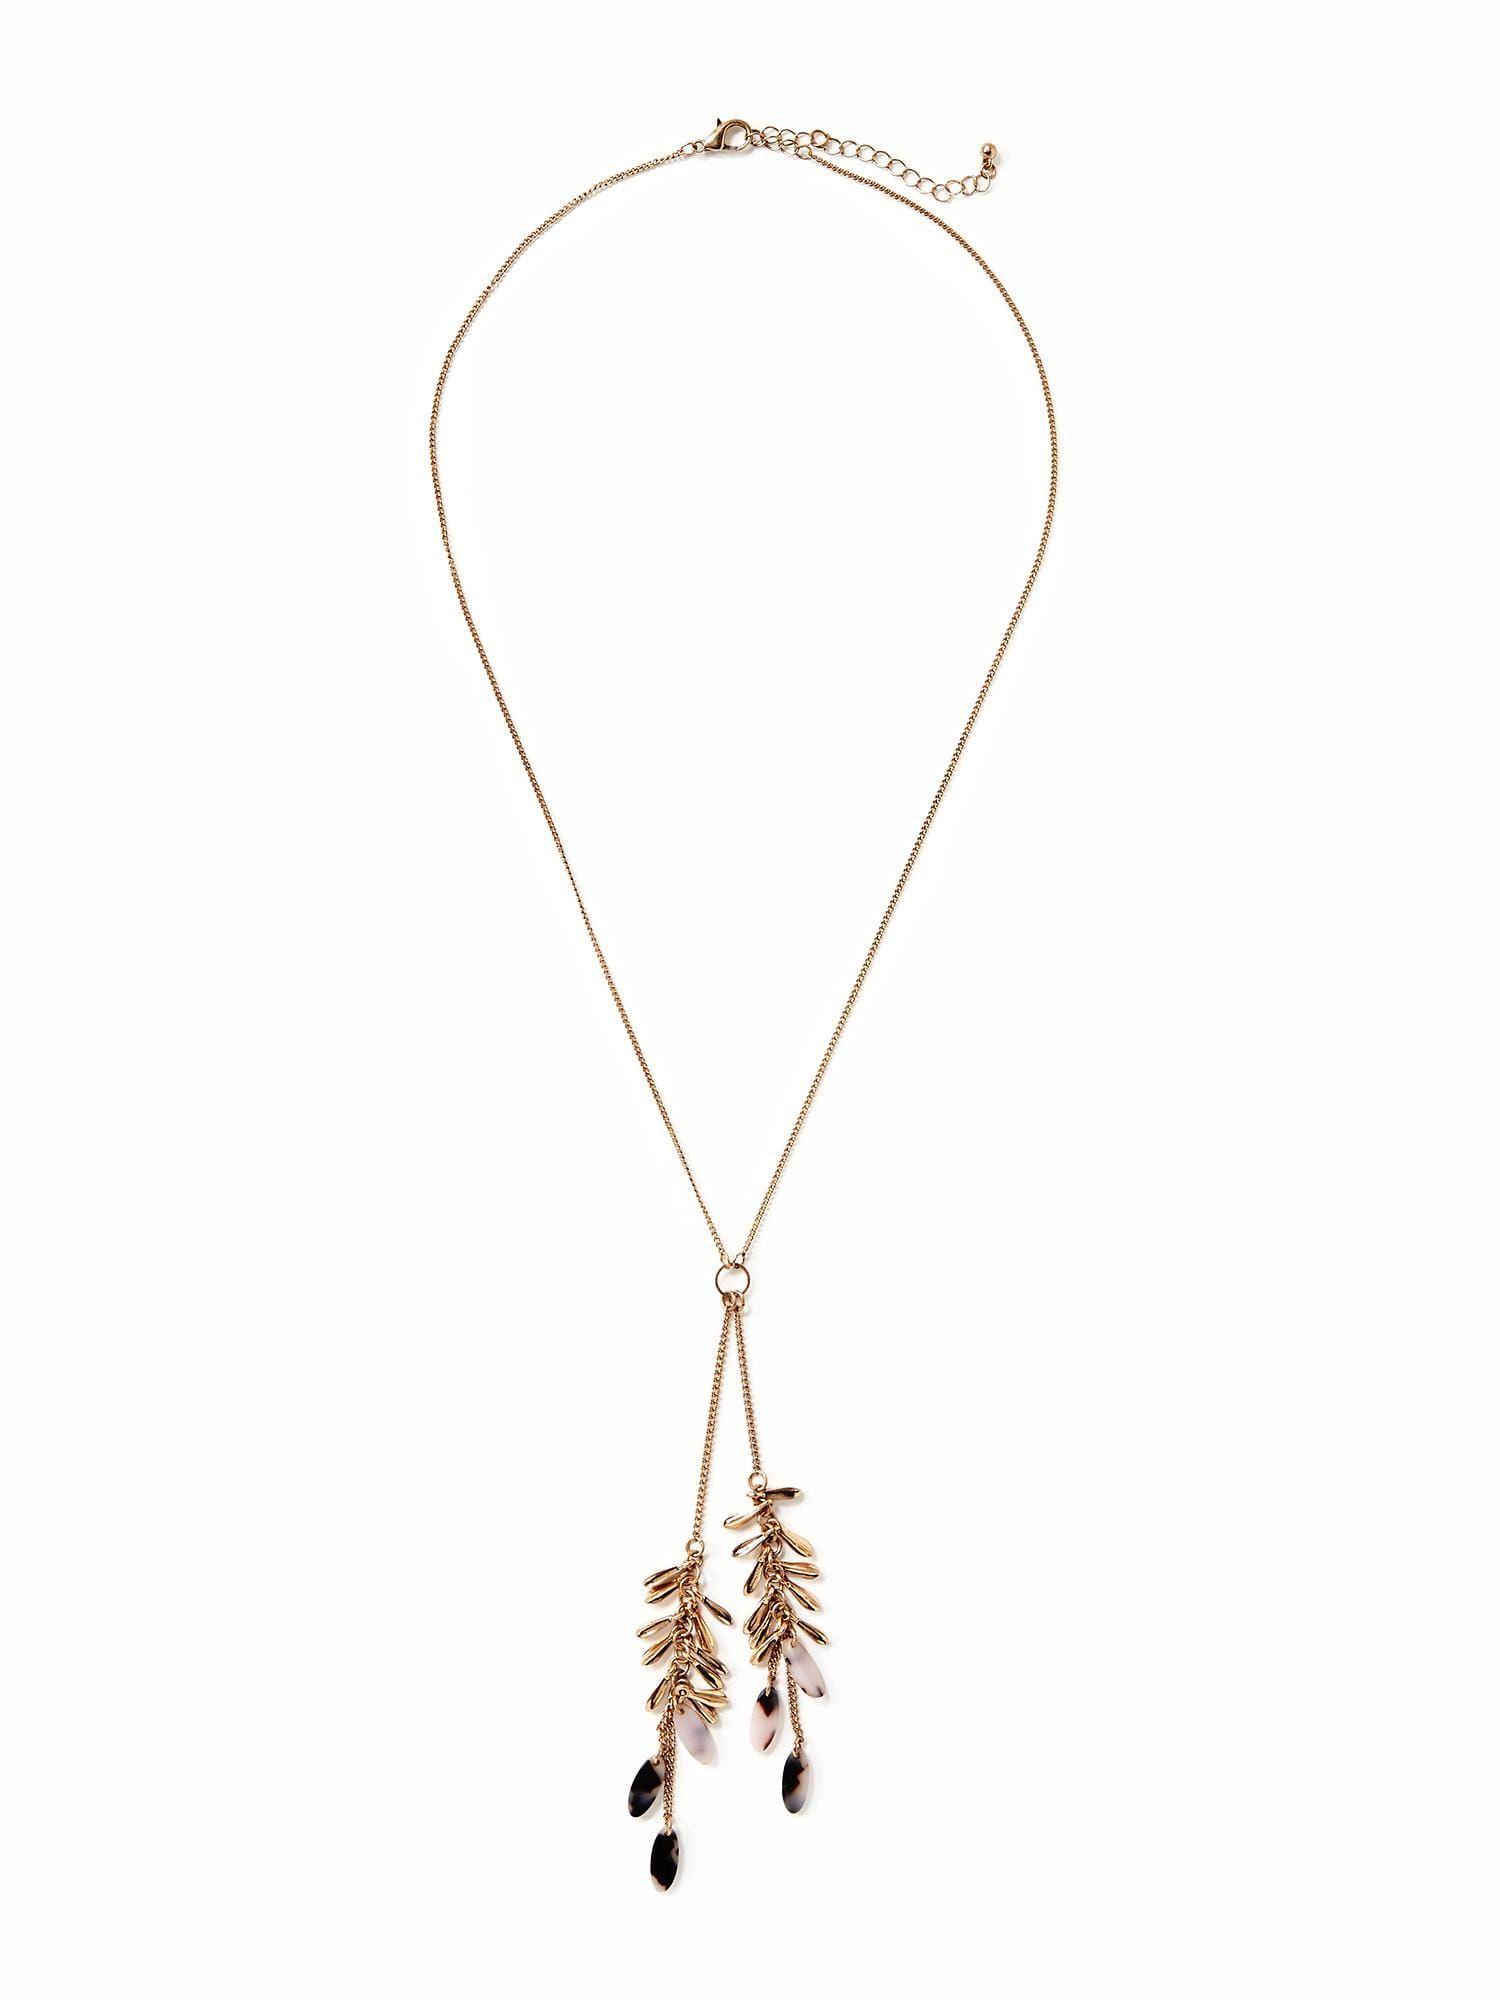 Marbledtortoiseshell pendant necklace for women old navy